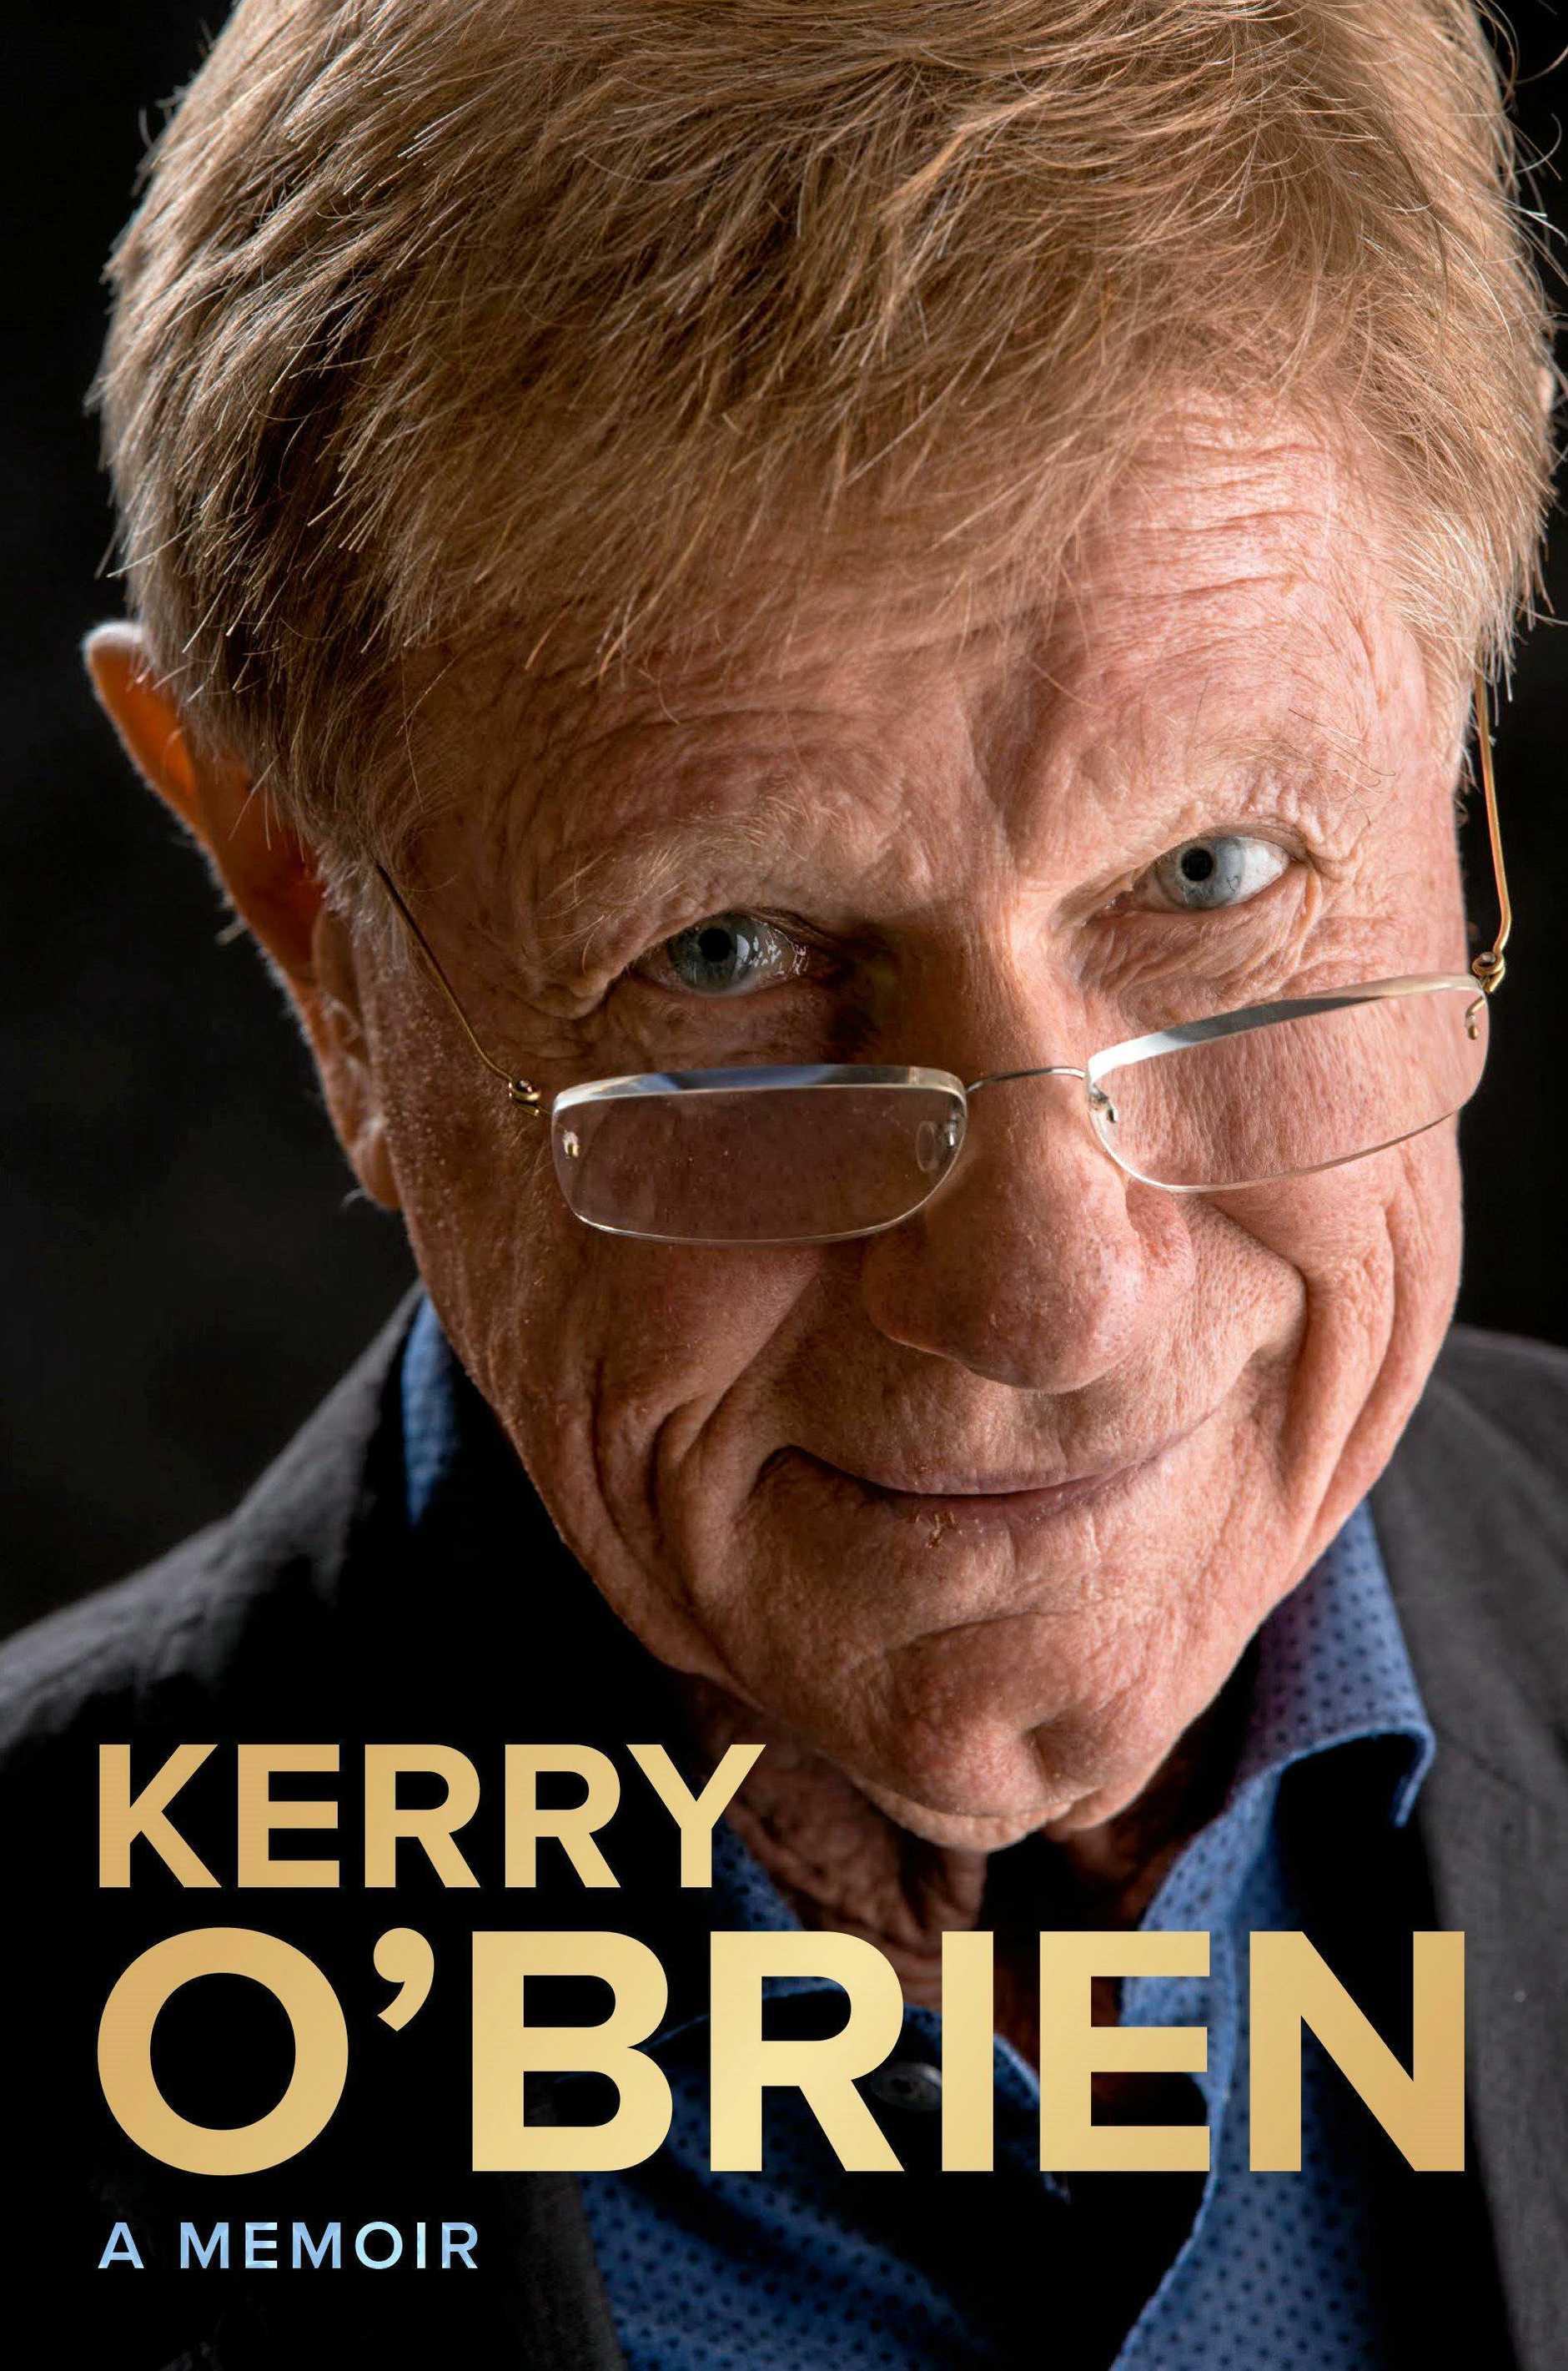 Cover art for journalist Kerry O'Brien's 2018 memoir.